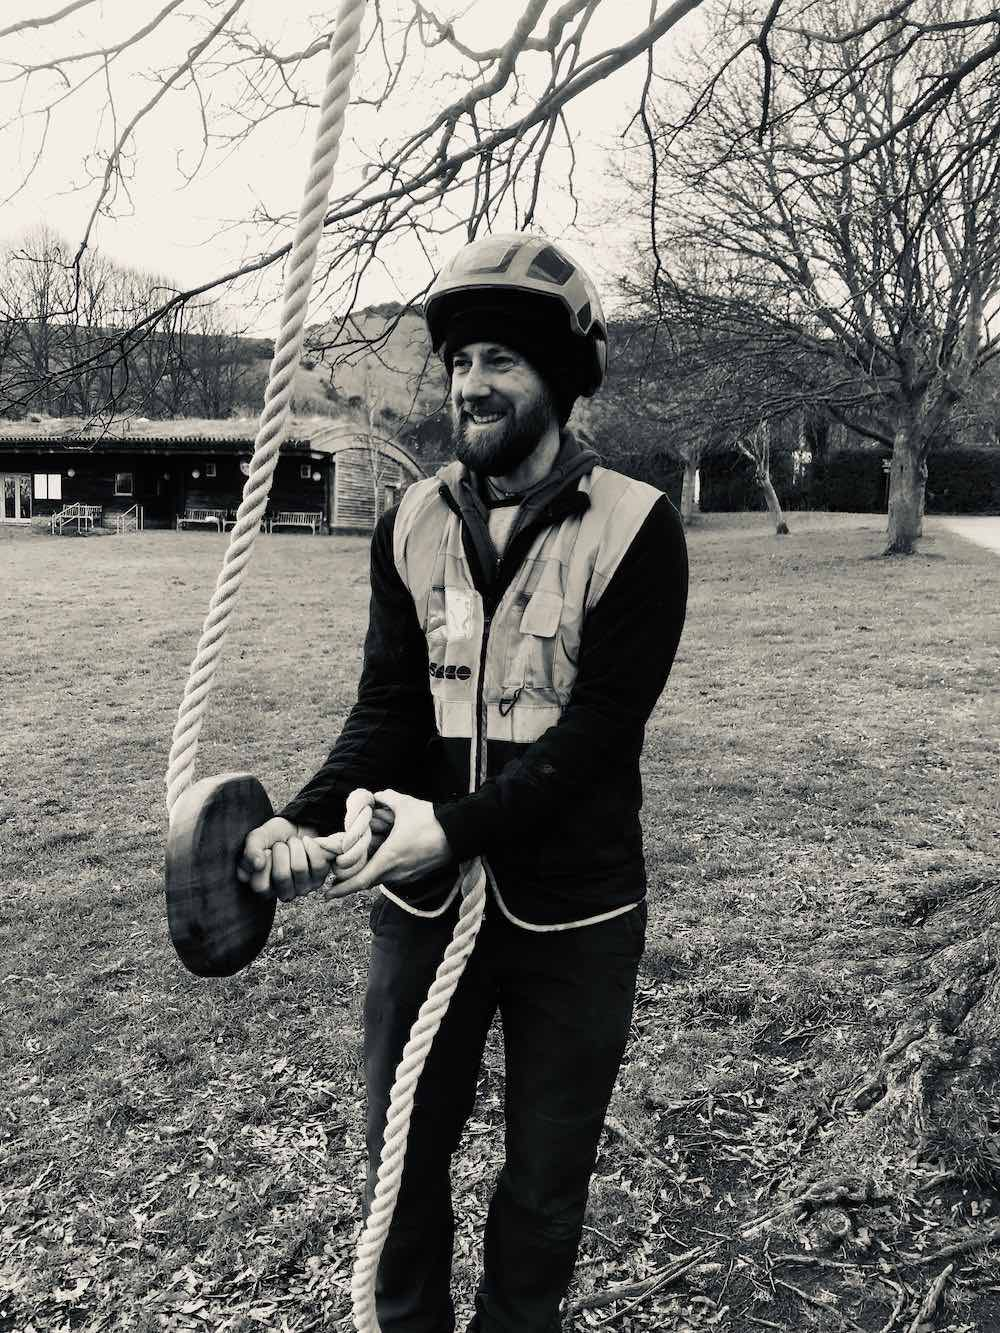 Joe Hallam of CAP.Co installs the new swing at Kingston Village Green